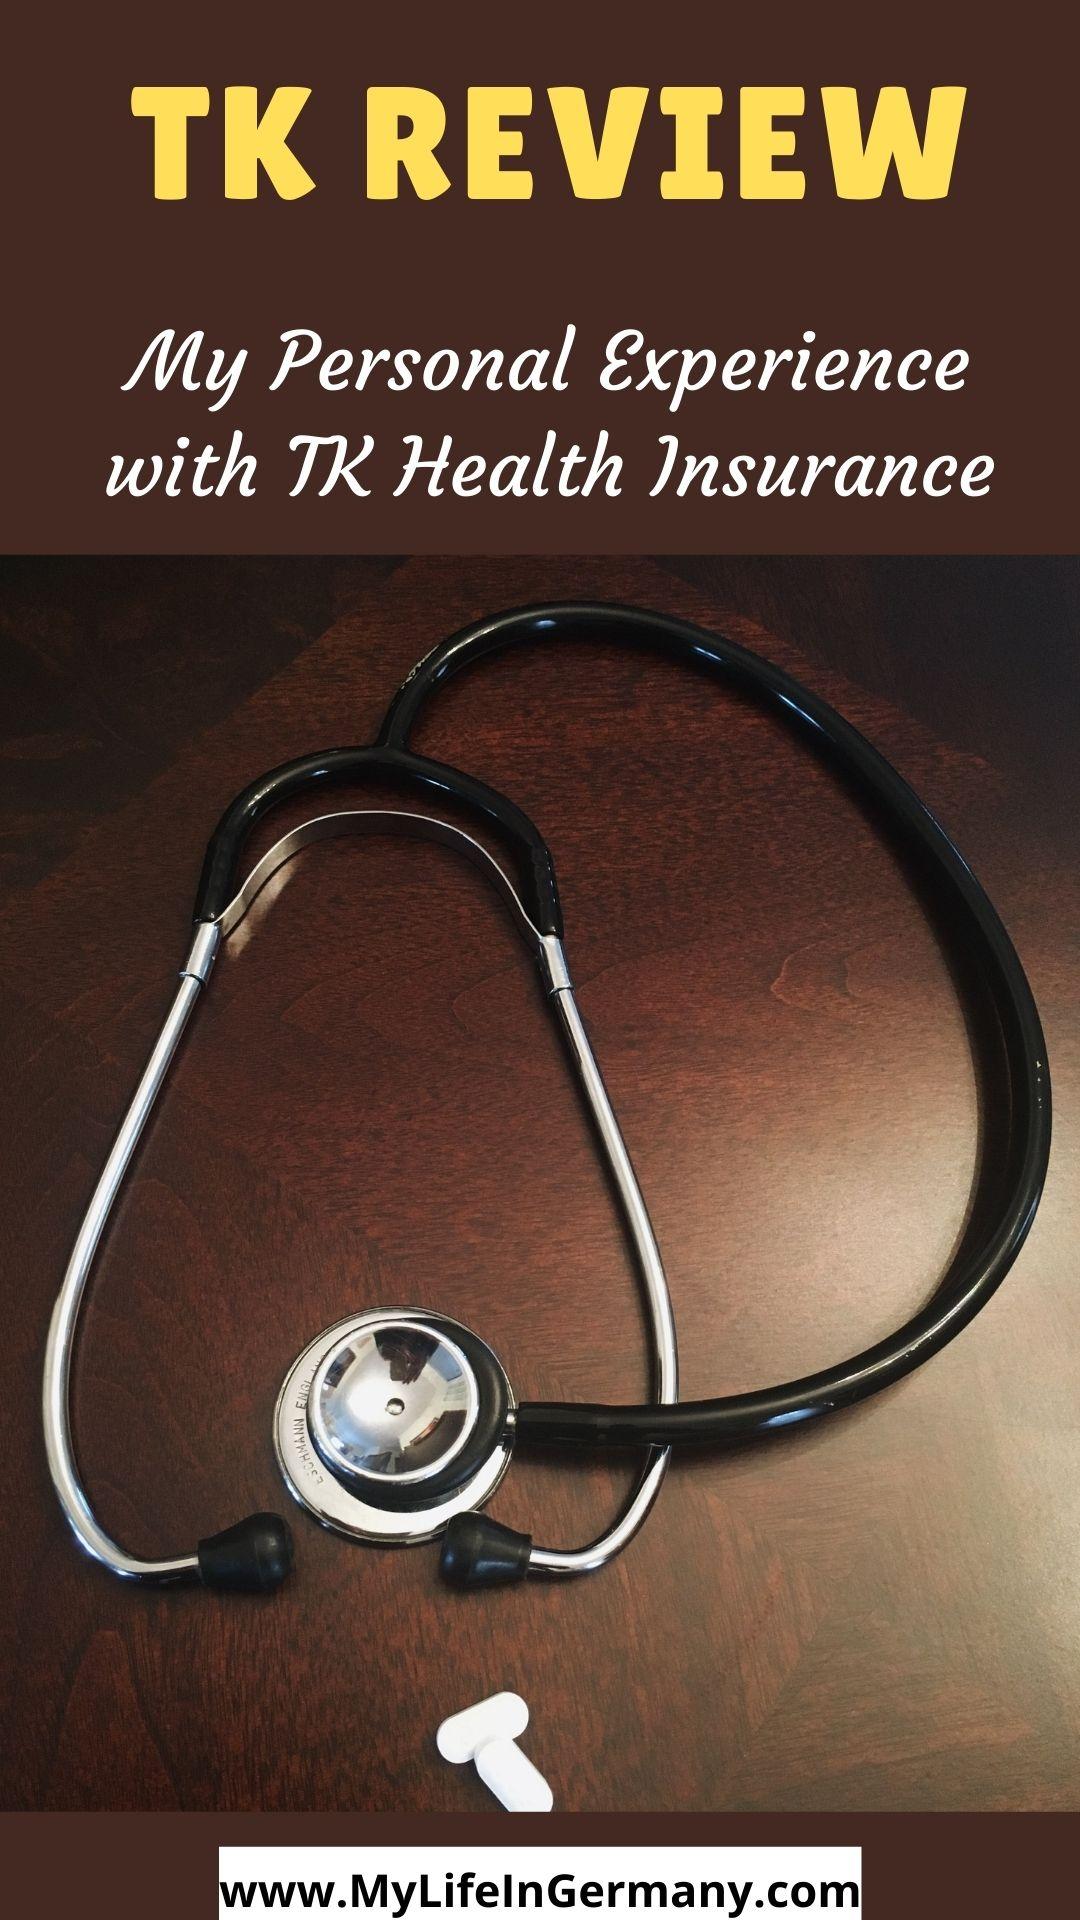 pinterest edited_TK review_my personal experience with tk health insurance_good customer rating_Techniker Krankenkasse